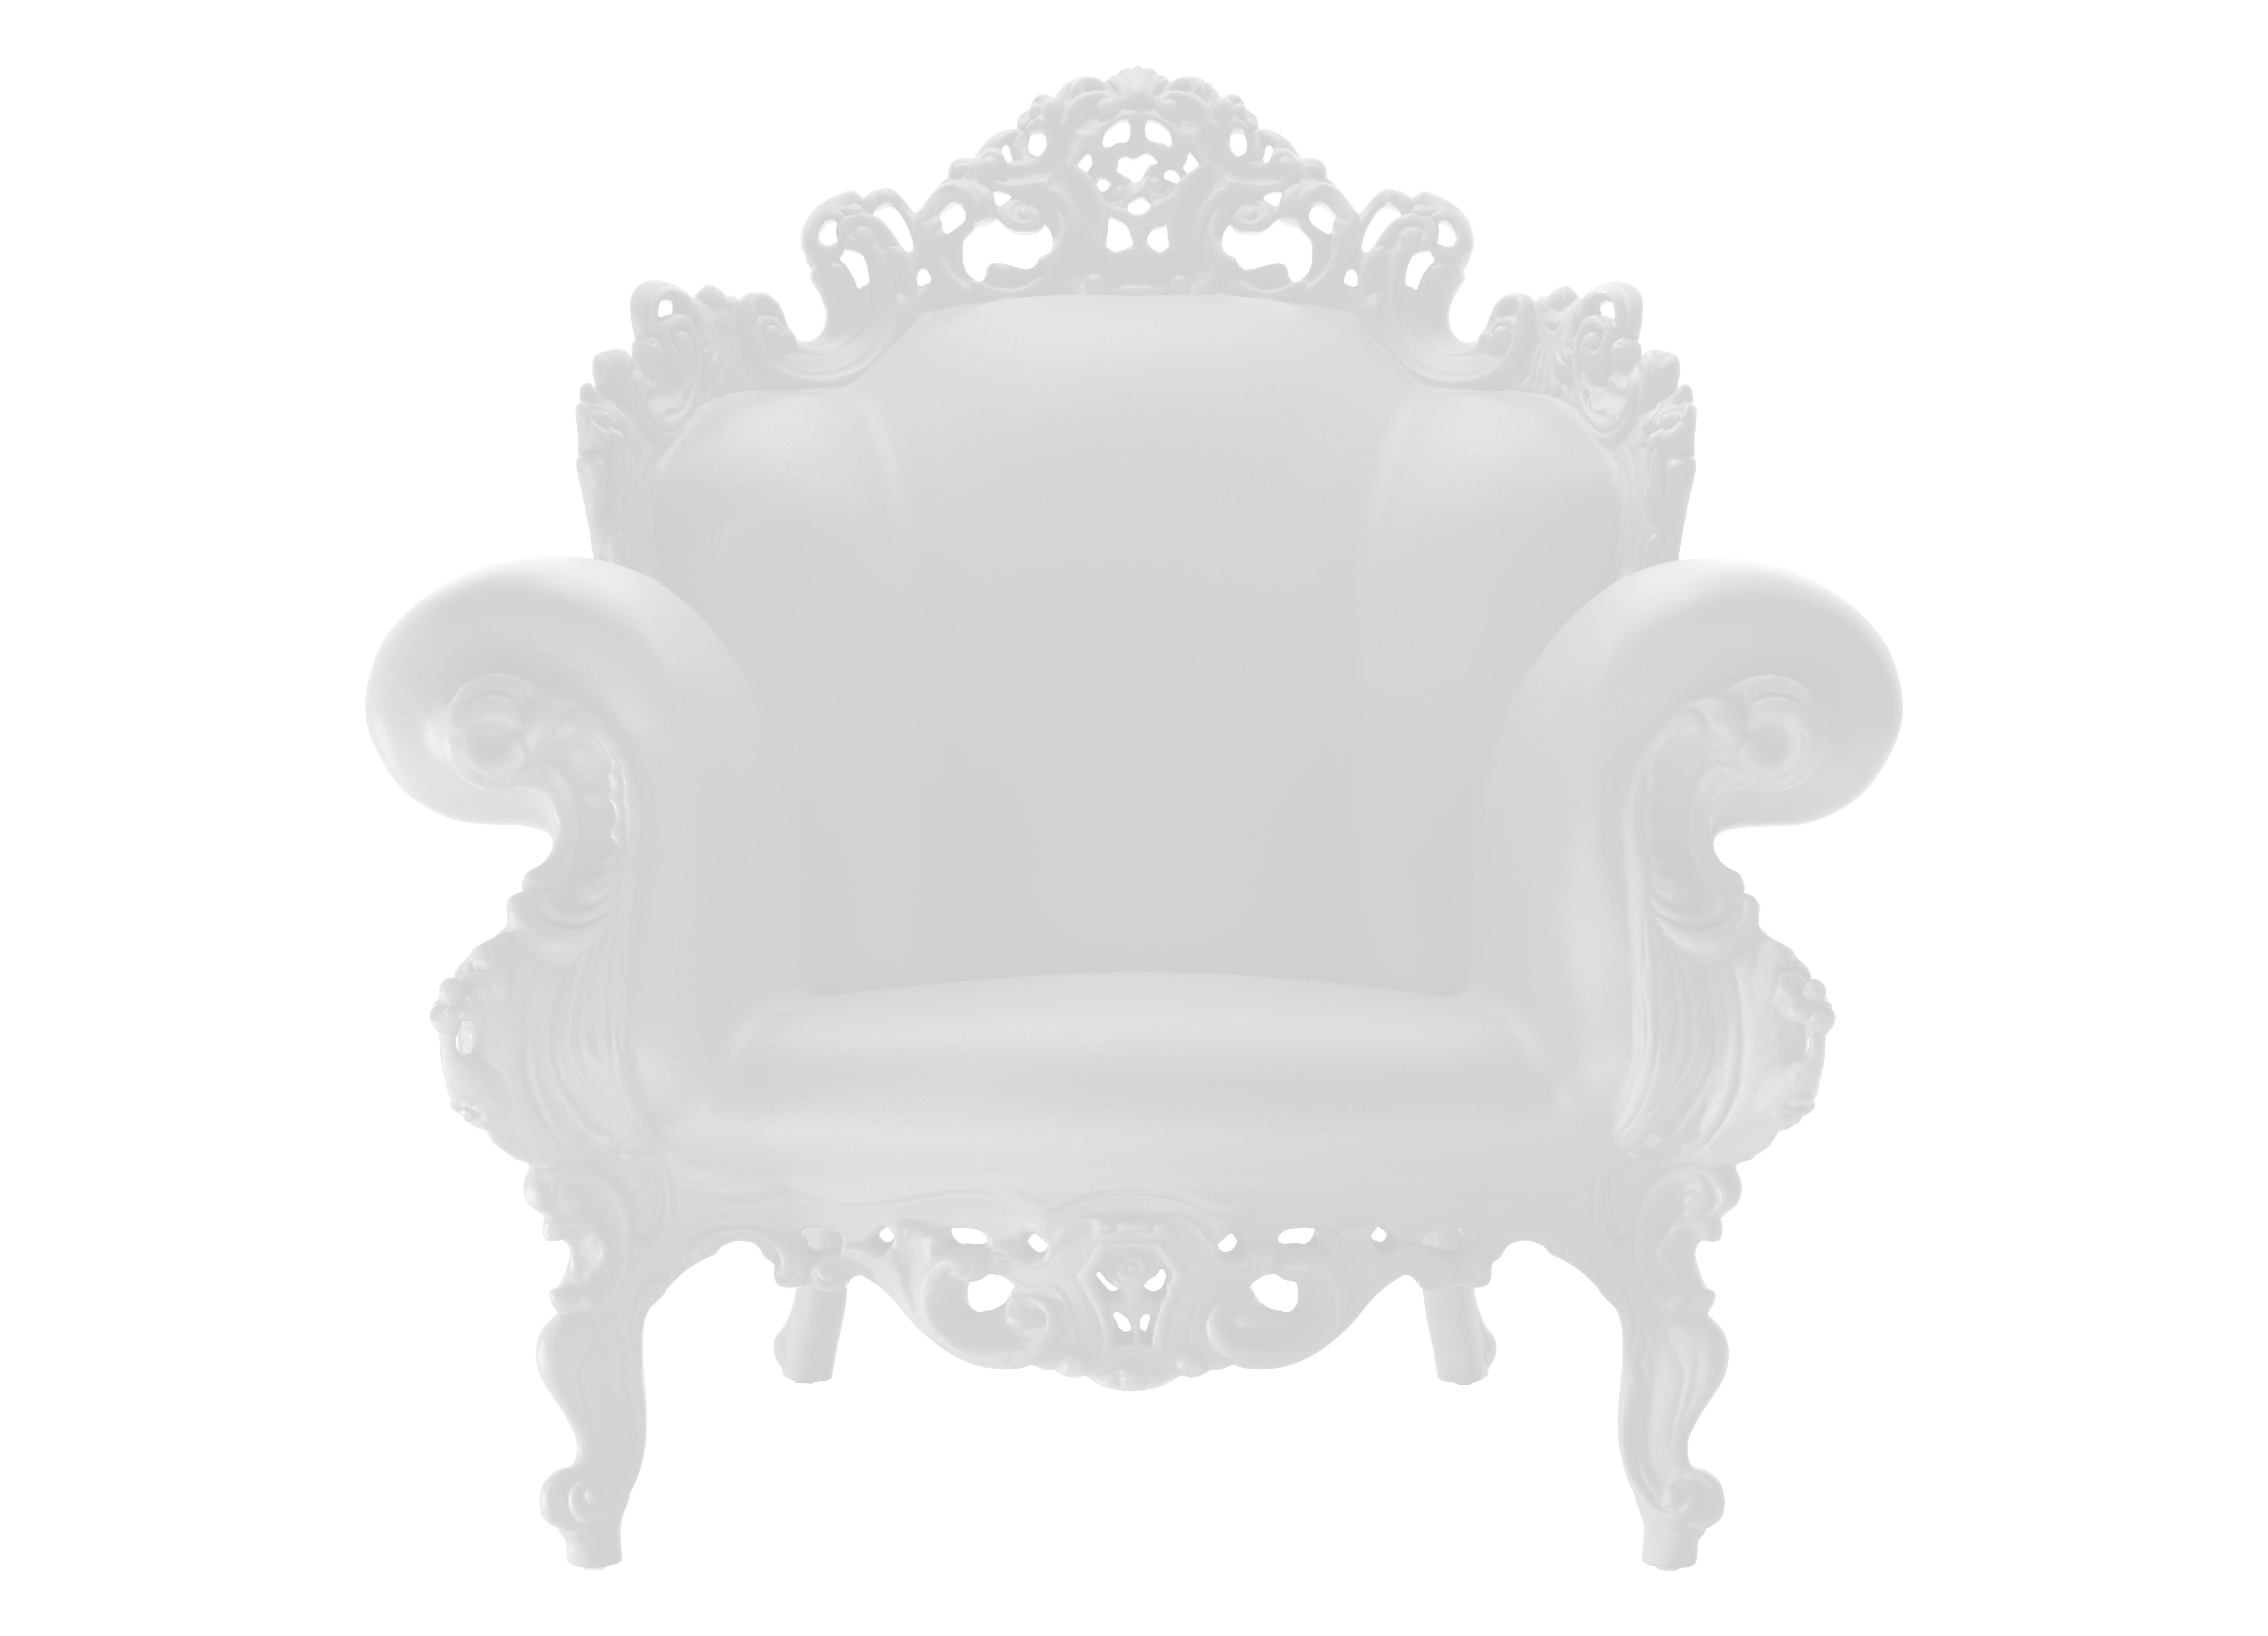 Arredamento - Mobili Ados  - Poltrona Magis Proust di Magis - Bianco - Polietilene rotostampato